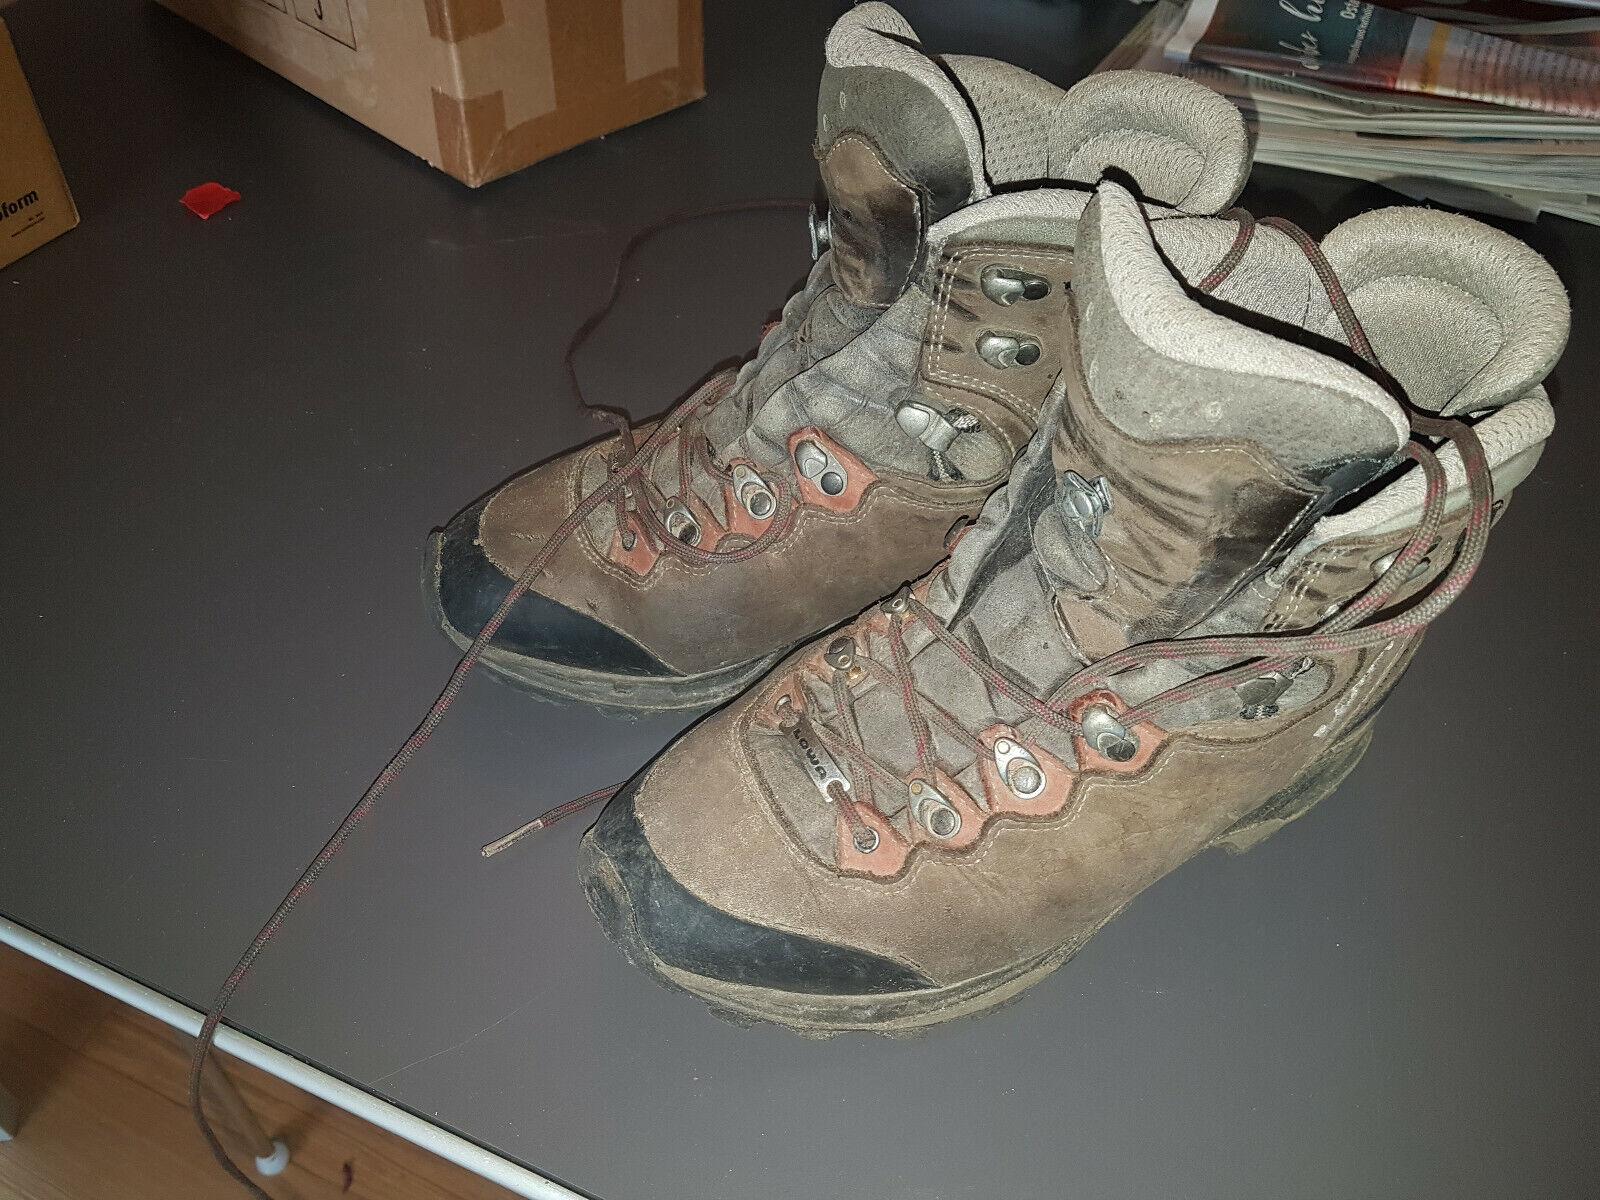 LOWA Gr. 6 Wanderschuhe Outdoor Stiefel Trekking - Damen - gebraucht